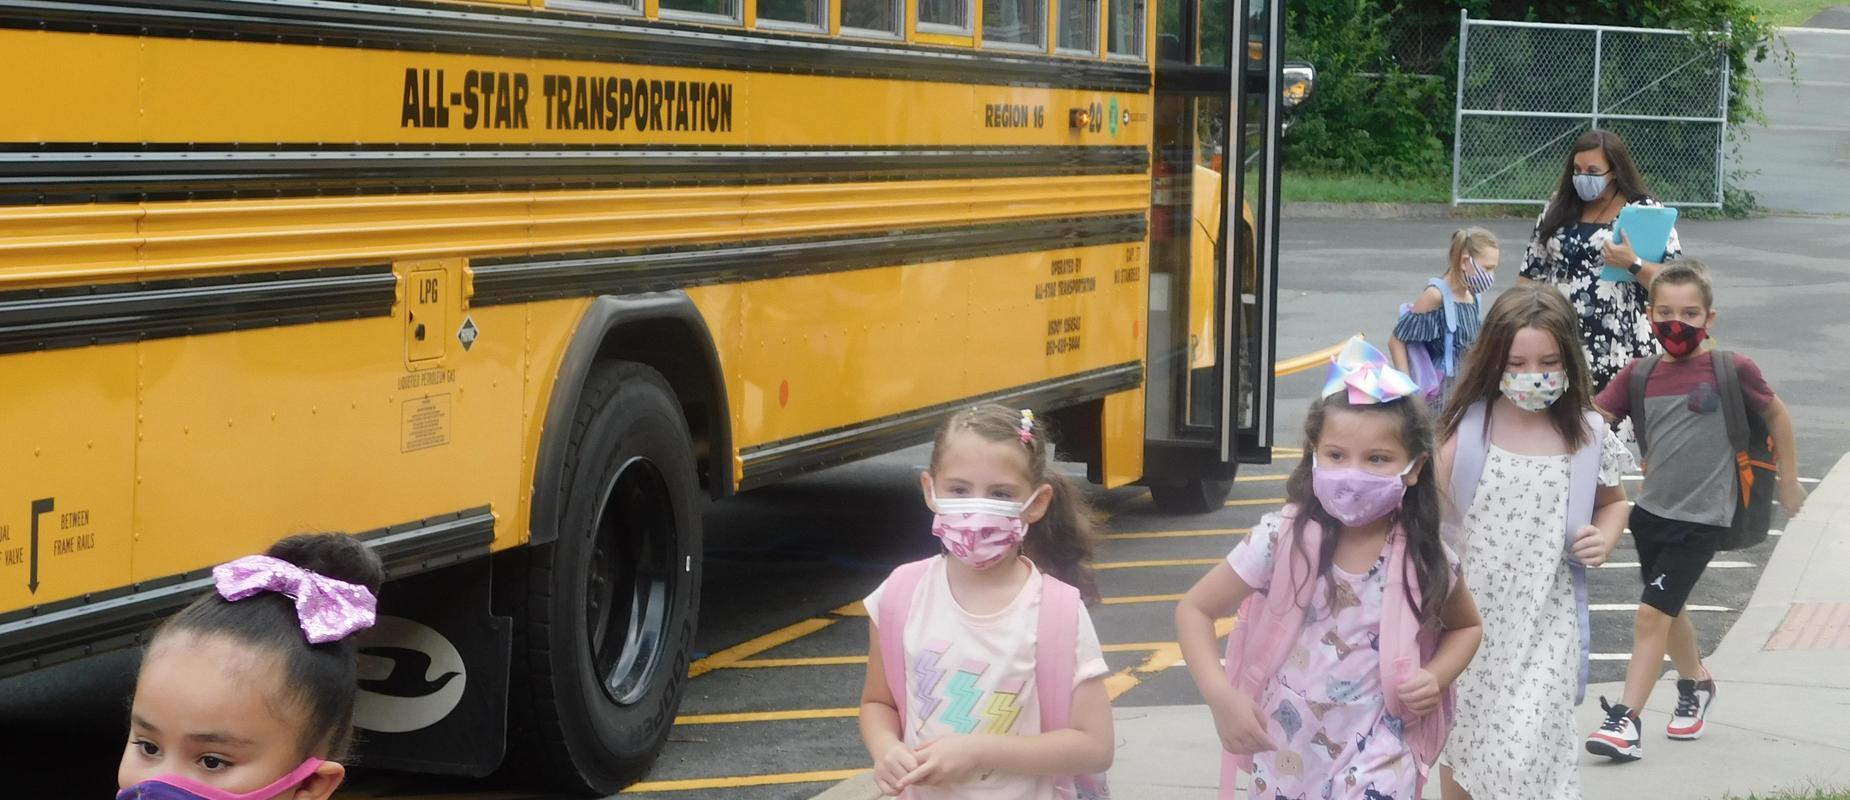 1st day of school at Laurel Ledge